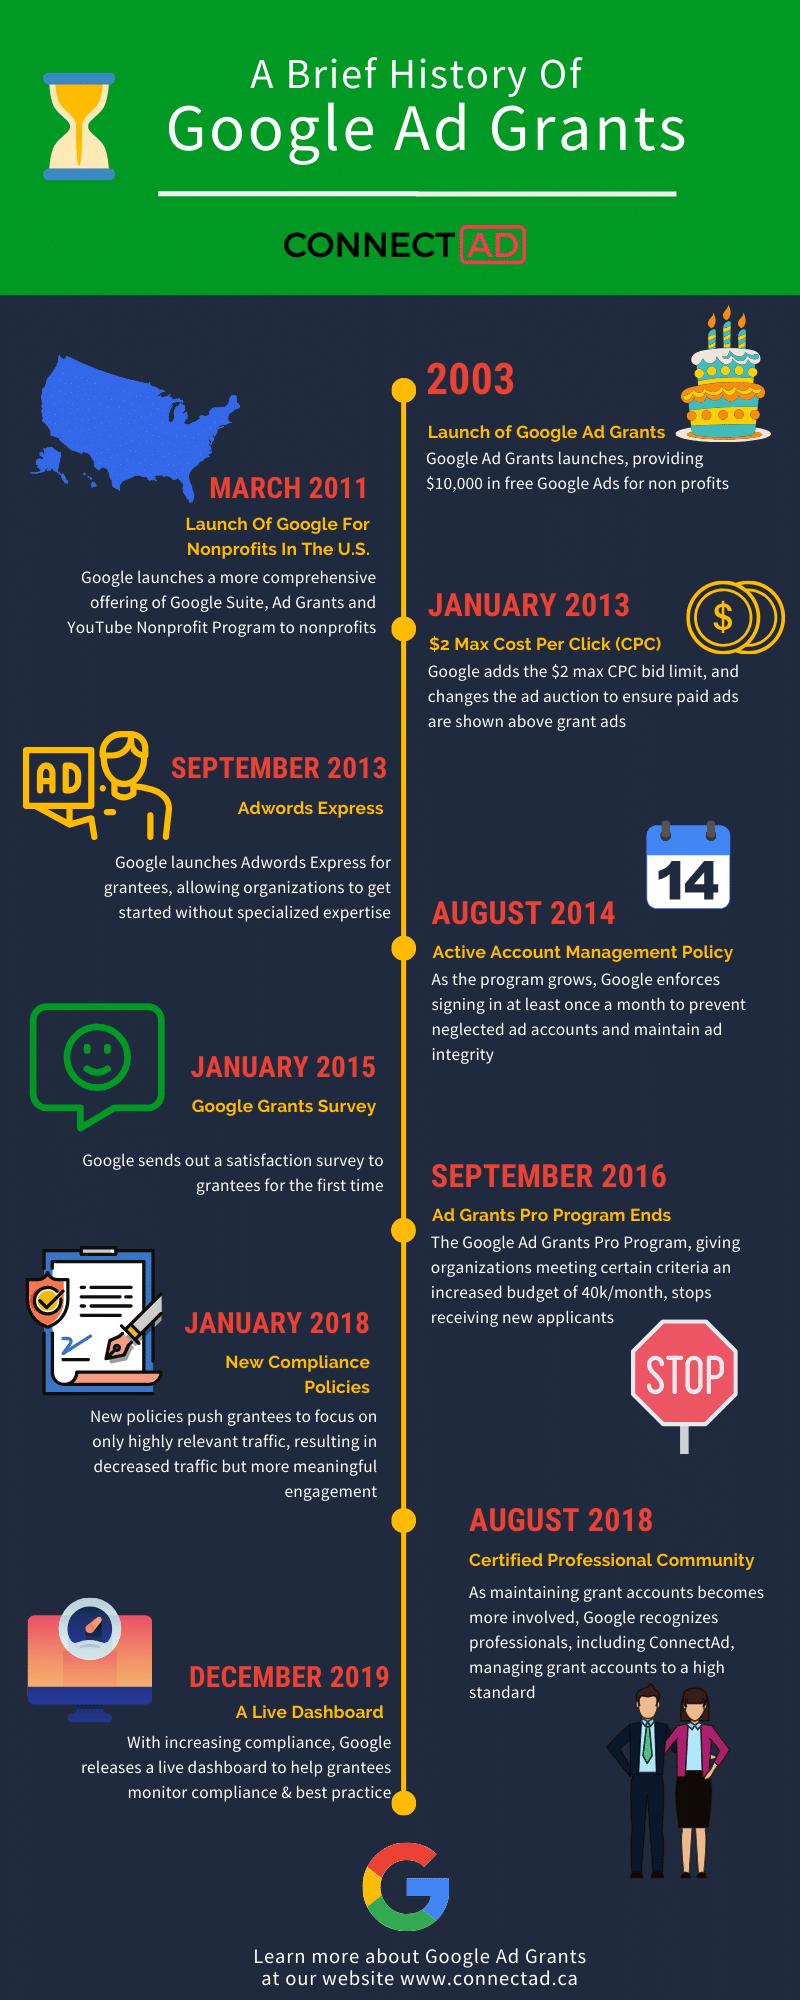 Timeline of Google Ad Grants